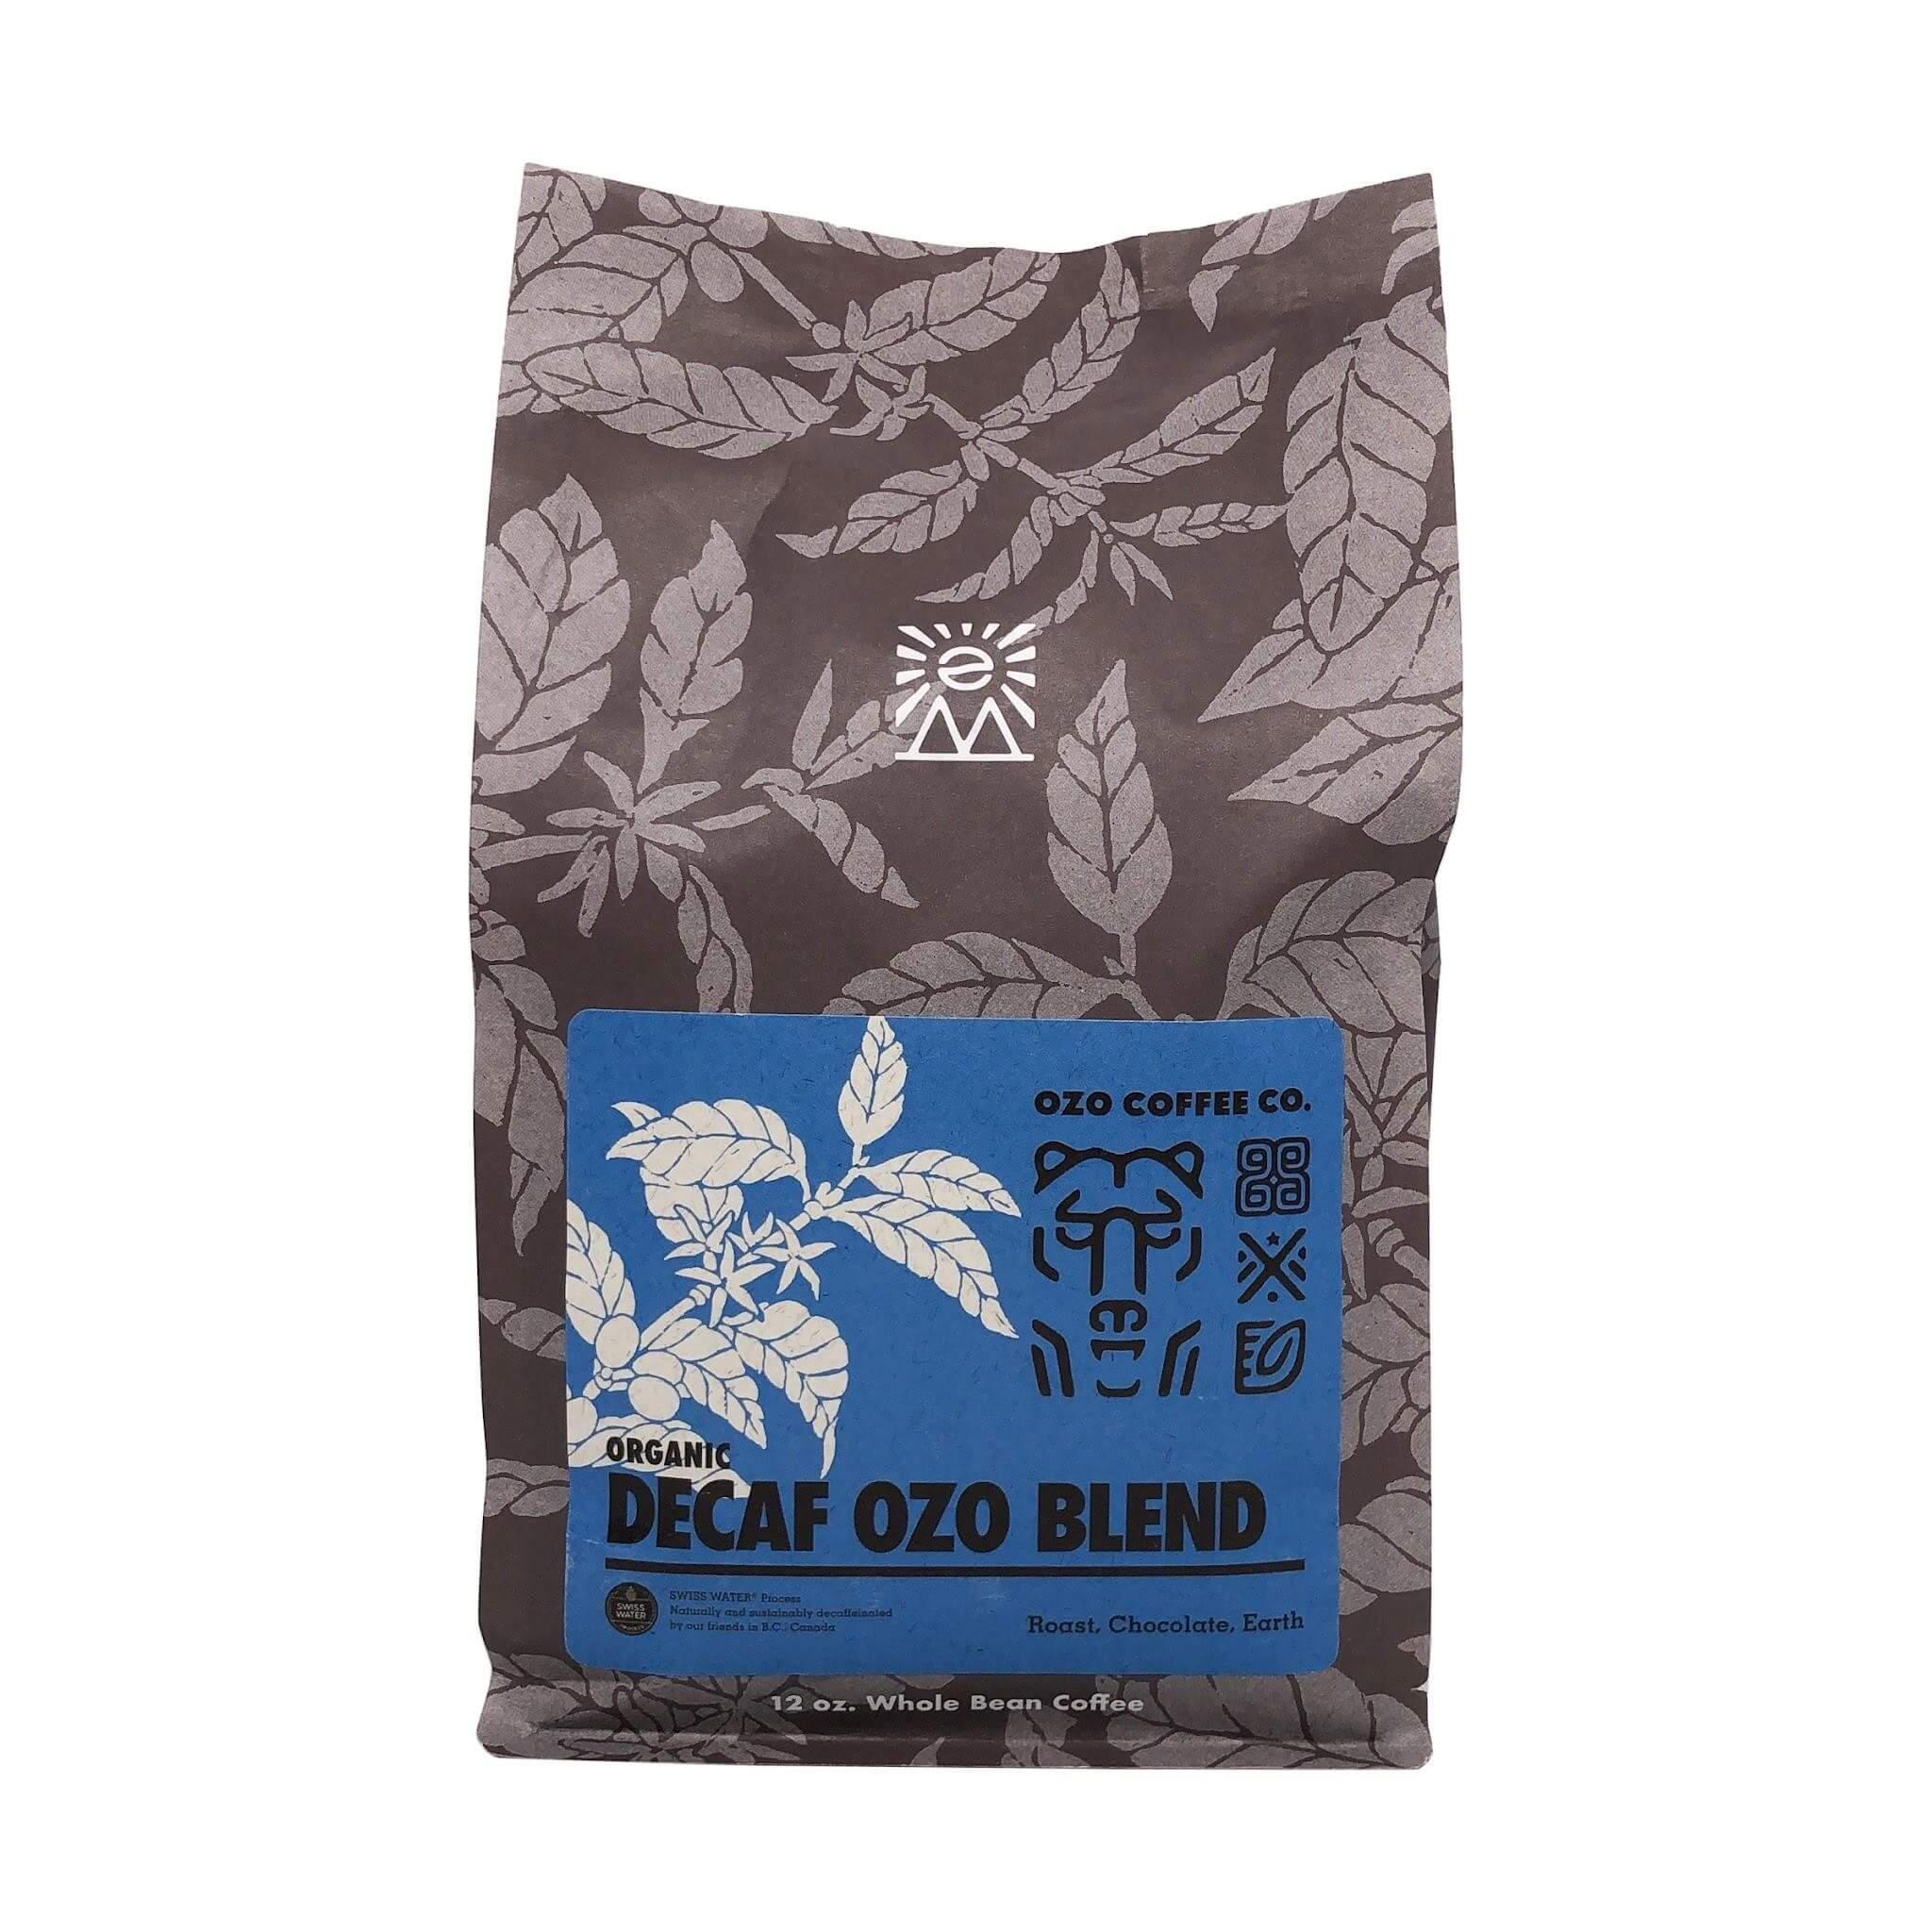 Ozo Coffee Bags